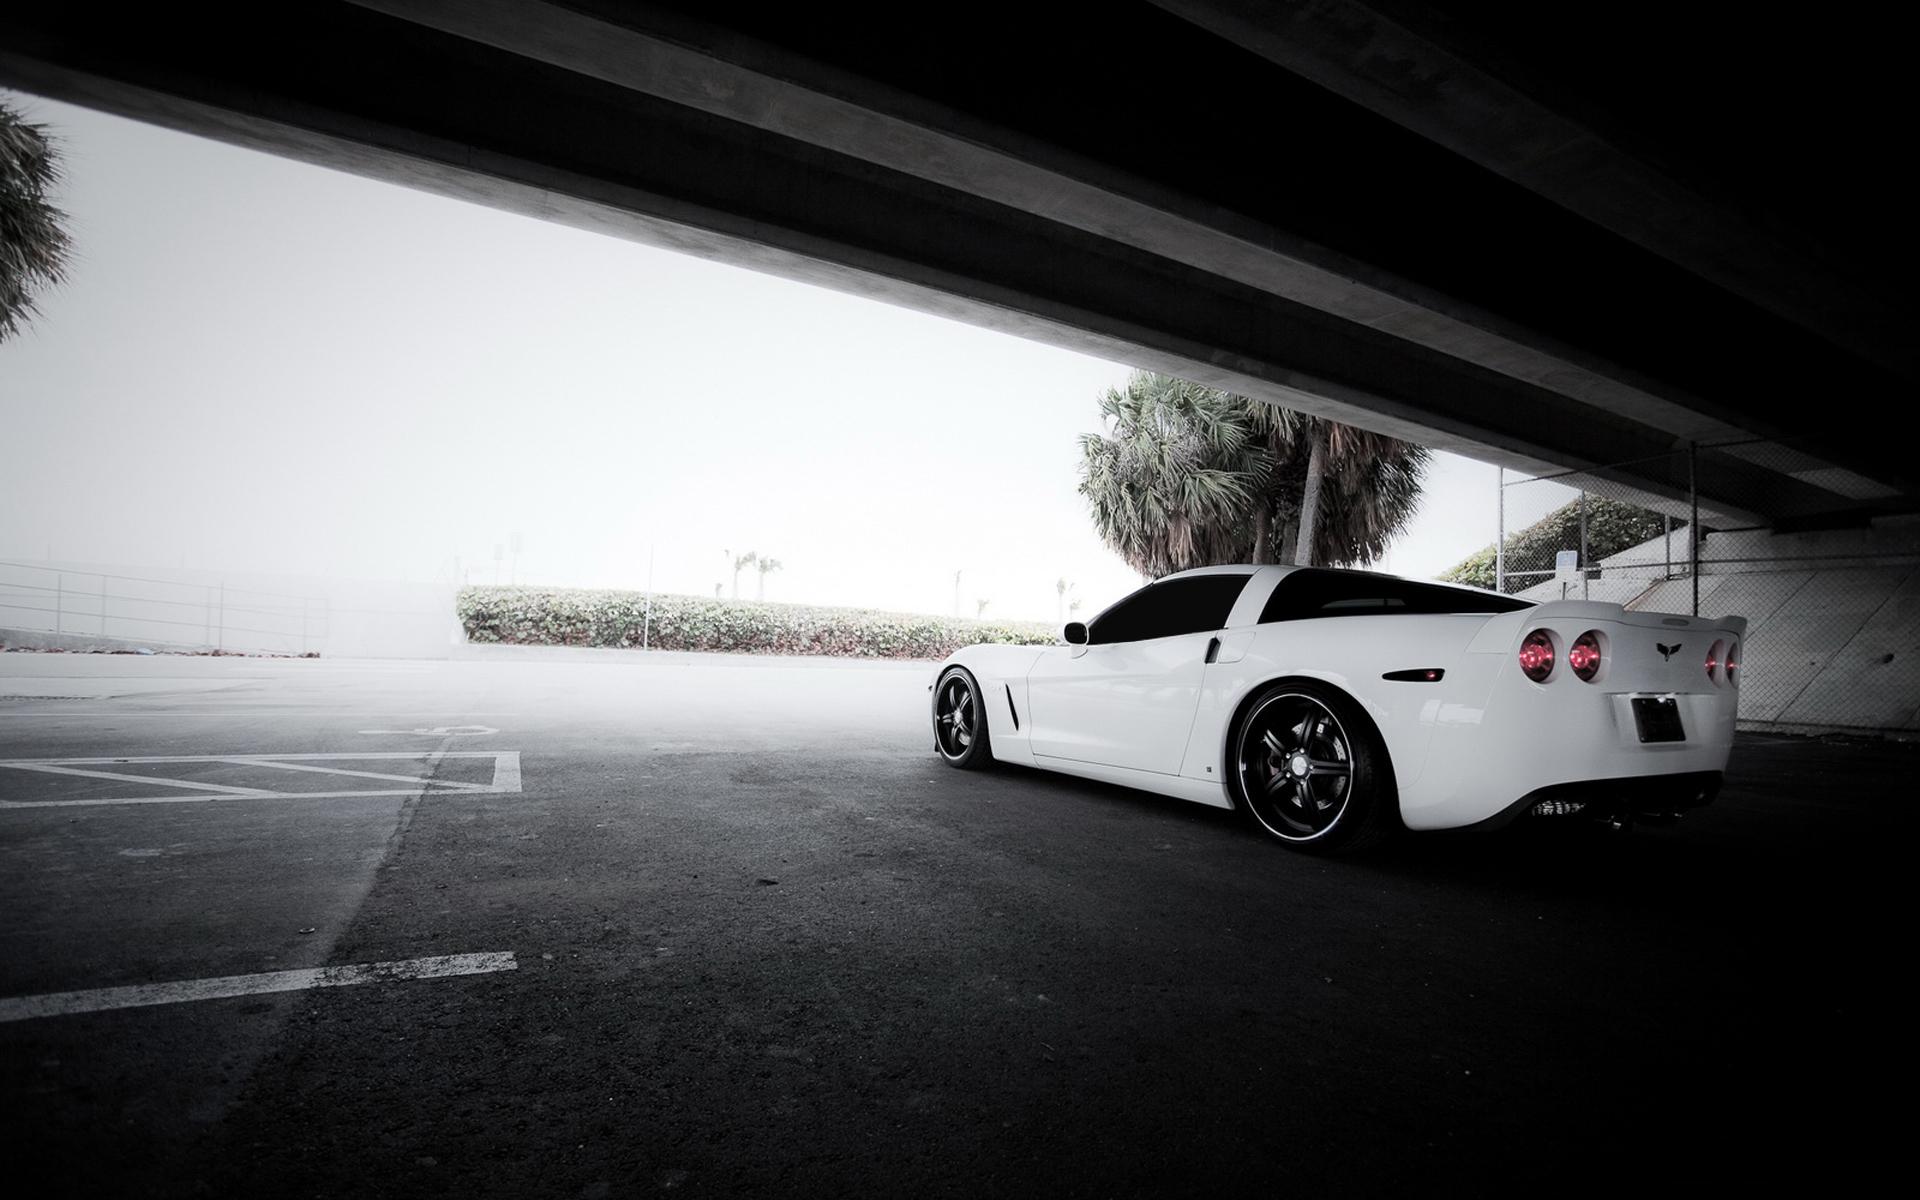 Corvette Wallpapers 9DX8OHT   4USkY 1920x1200